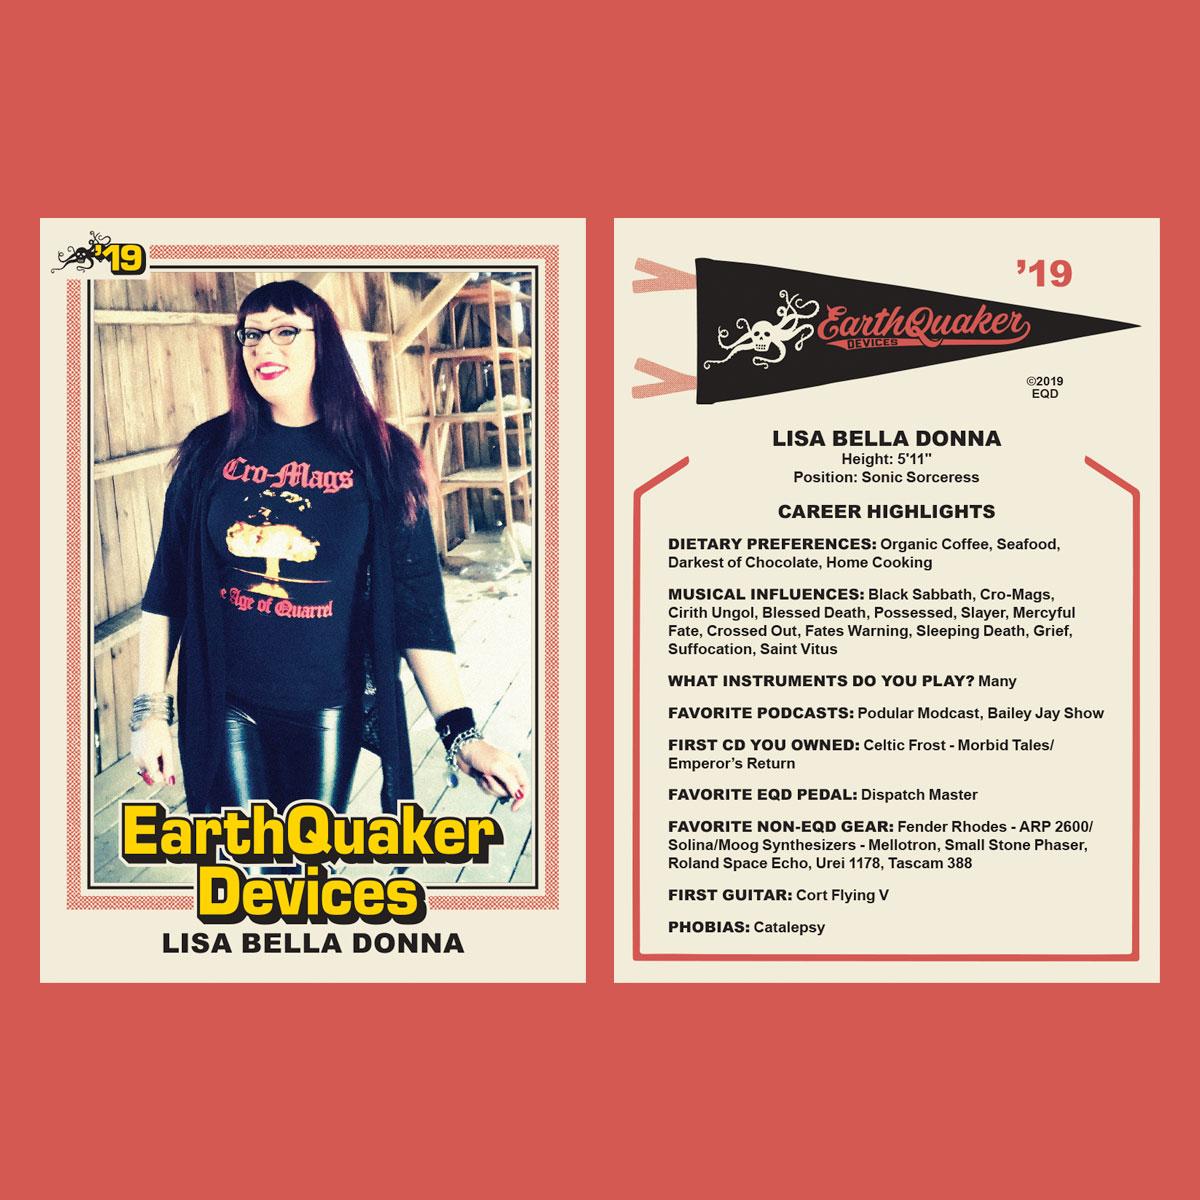 Lisa-Bella-Donna-Cards.jpg